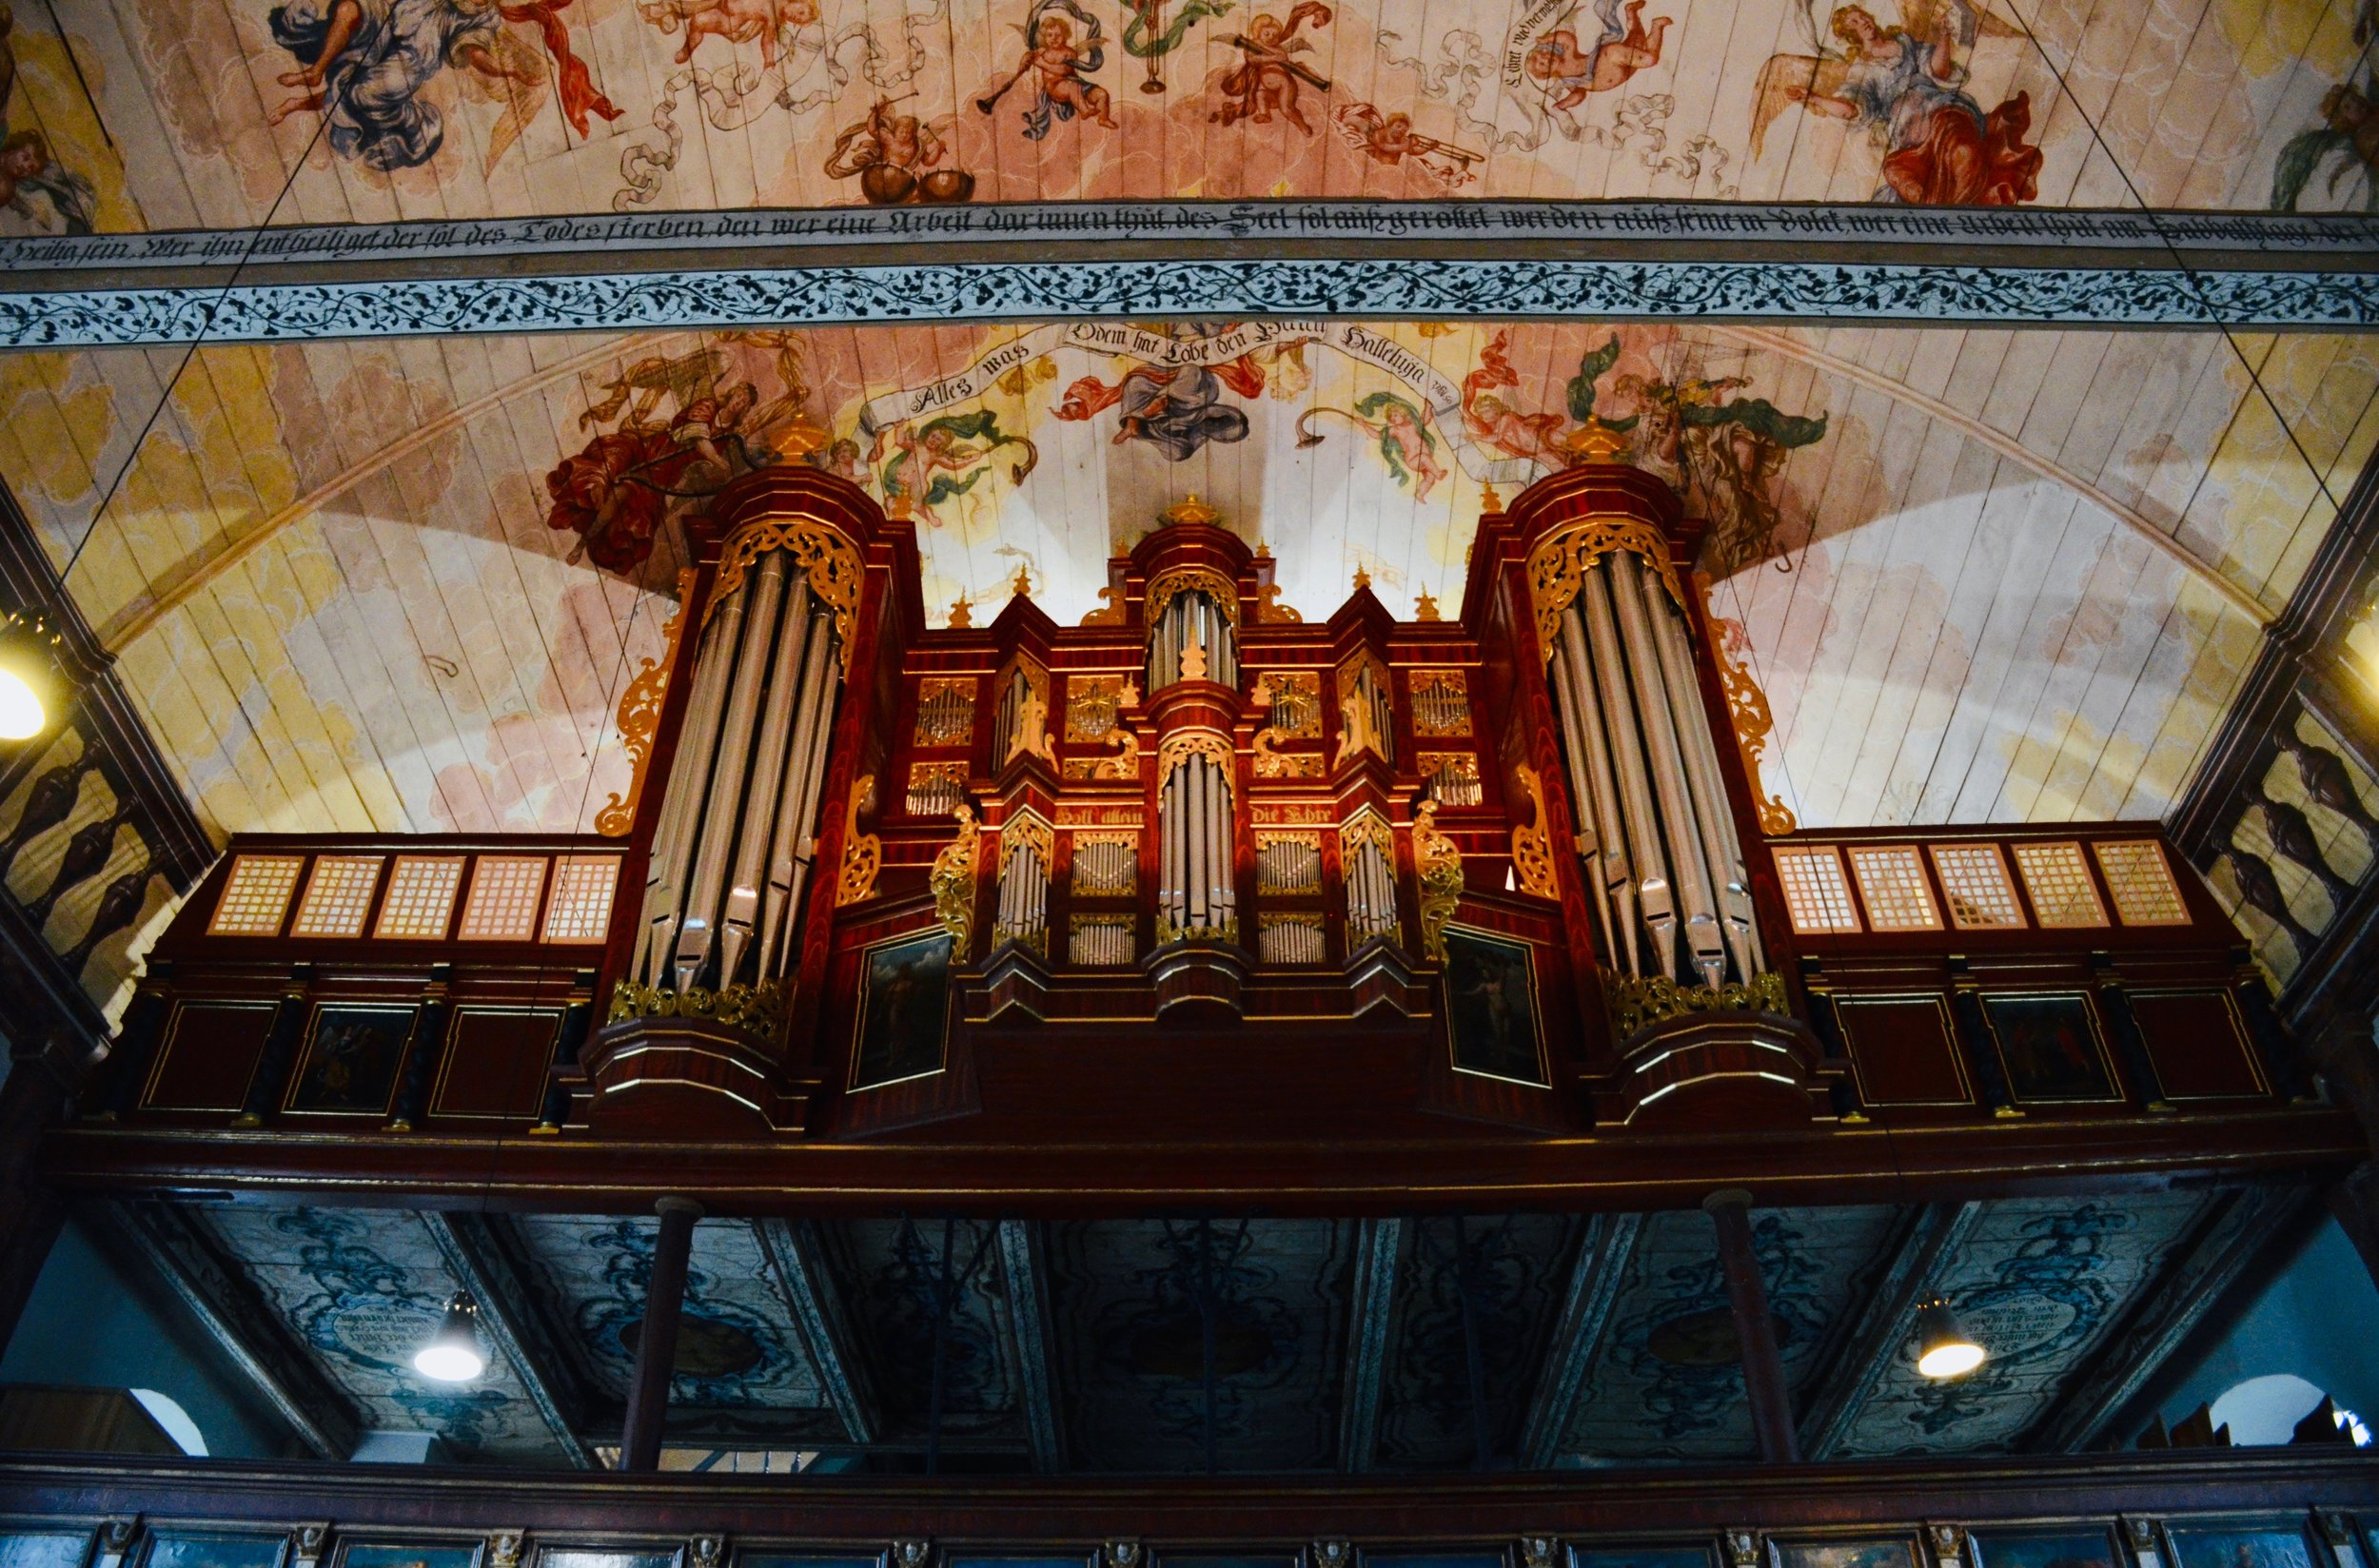 1688 Schnitger organ in Neuenfelde, Germany.